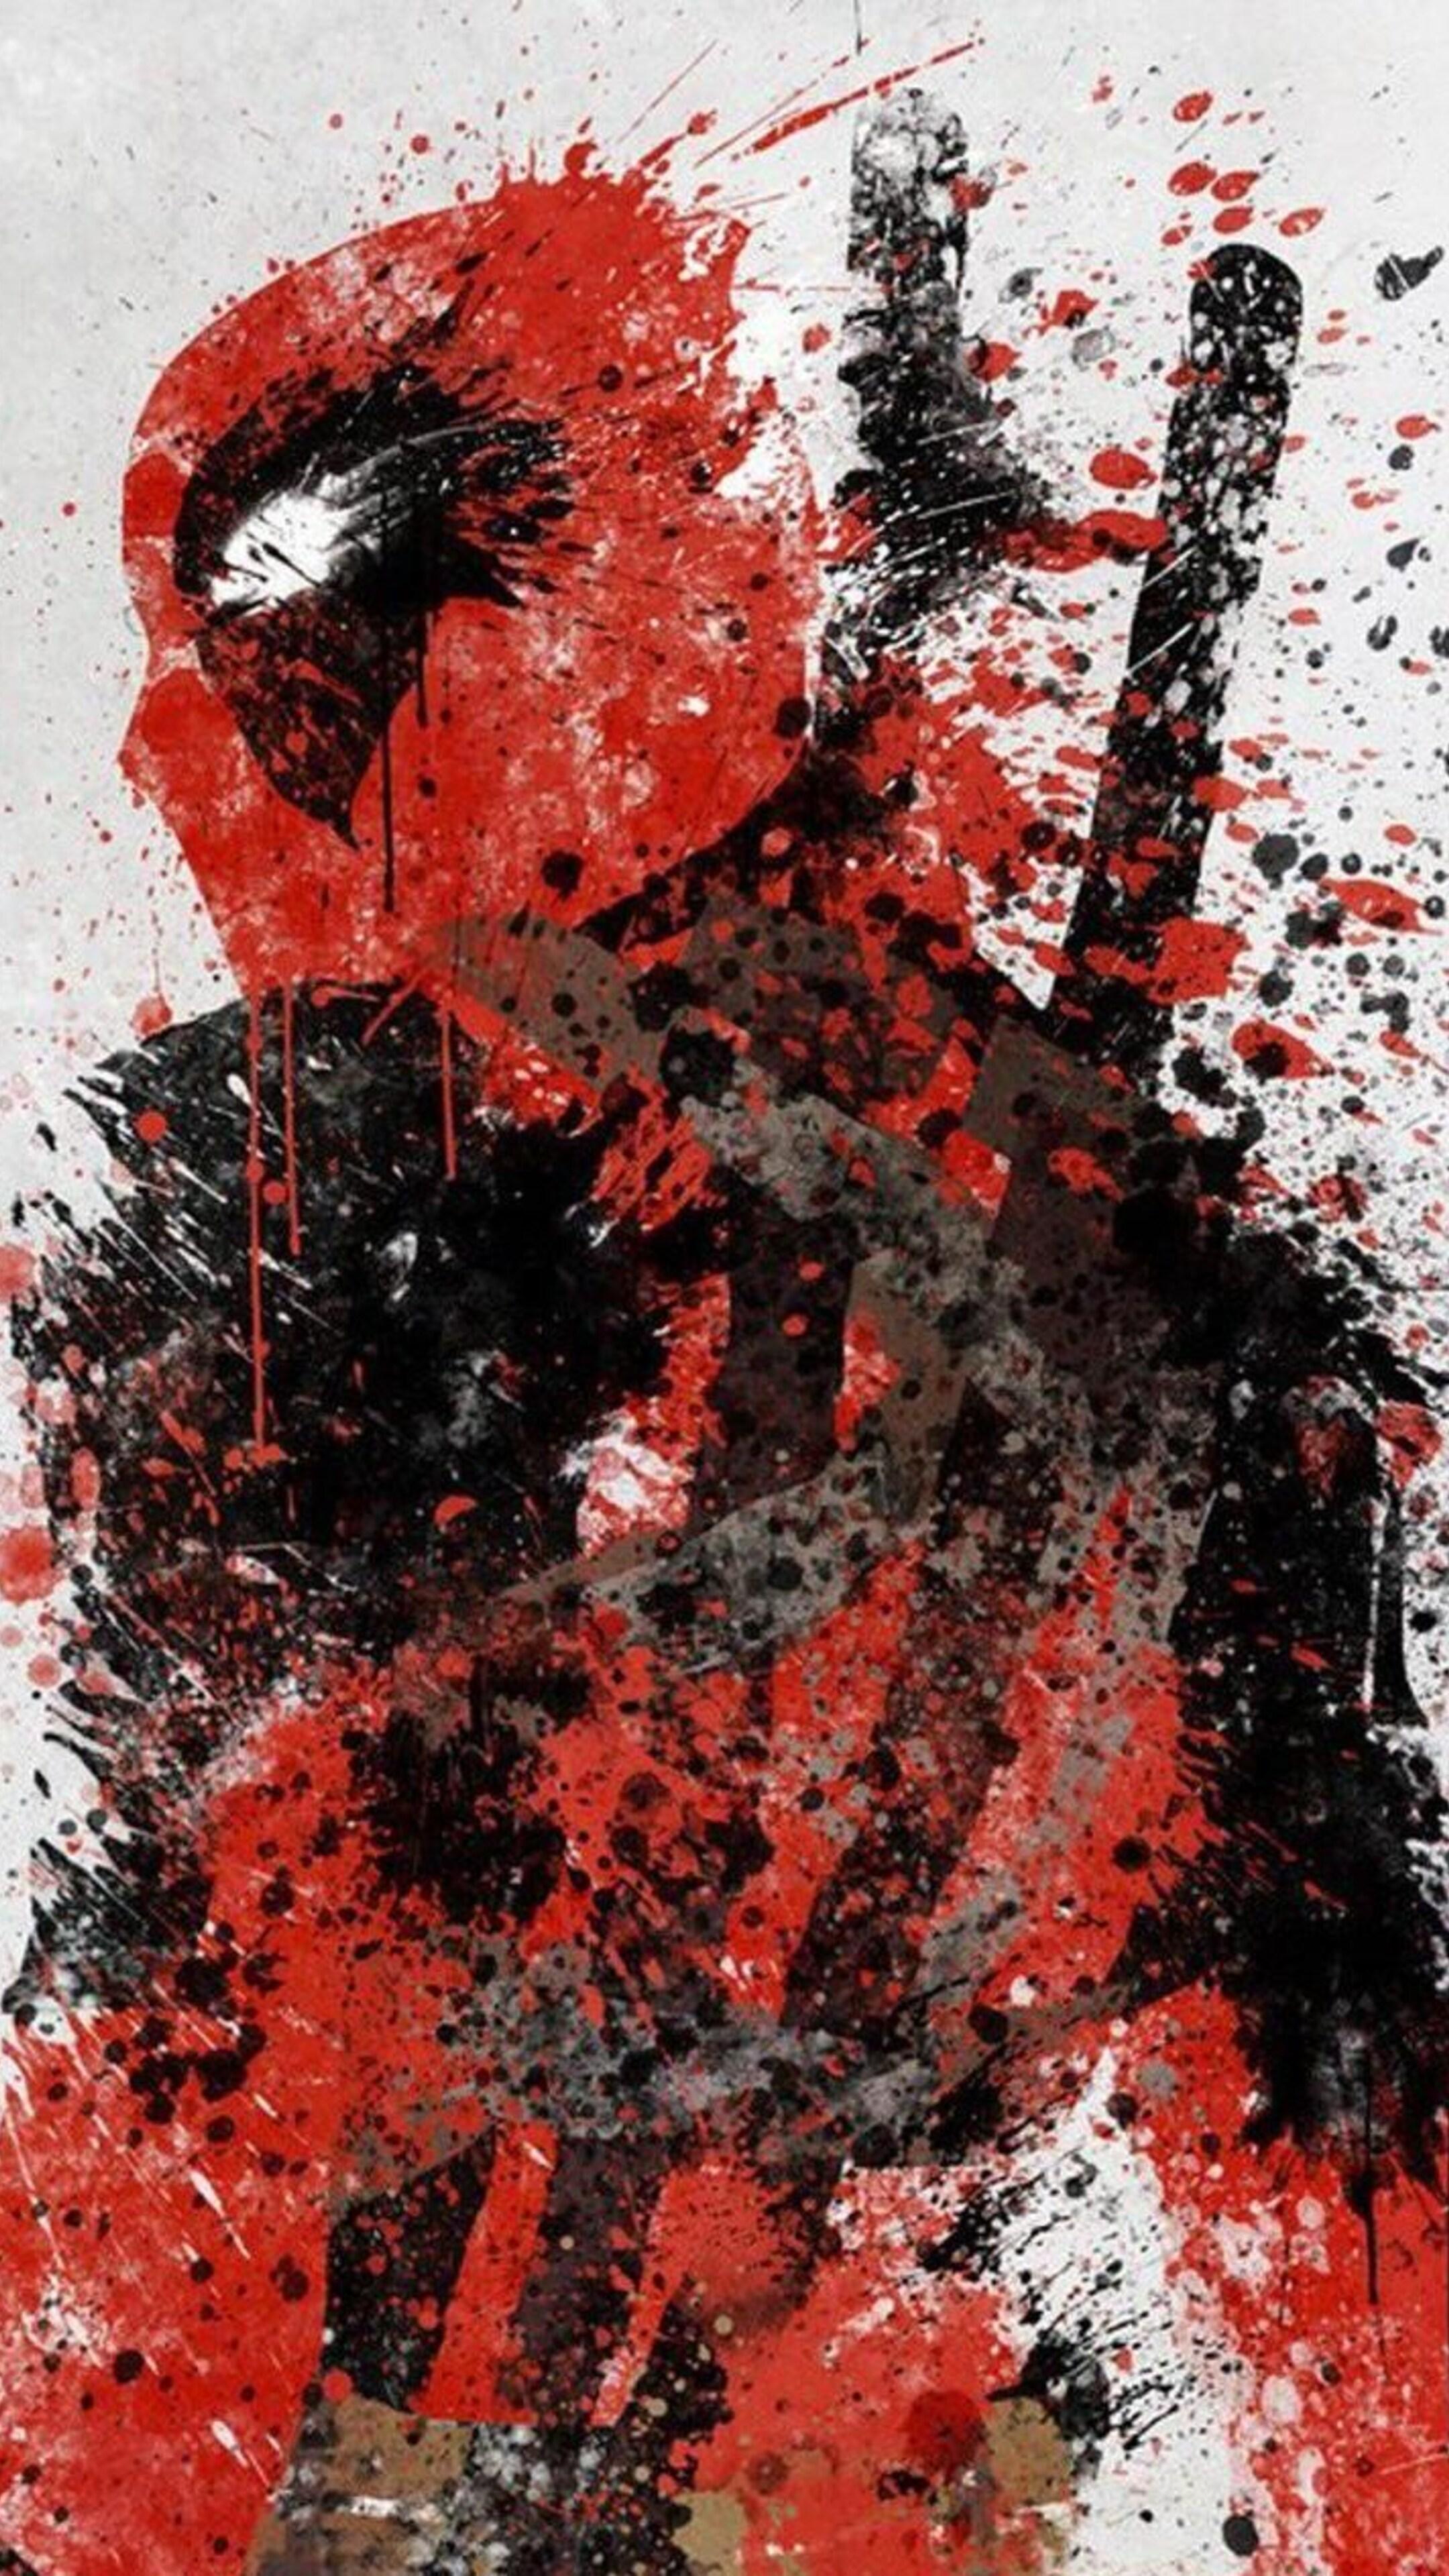 2160x3840 deadpool artwork sony xperia x xz z5 premium hd - Art wallpaper 2160x3840 ...